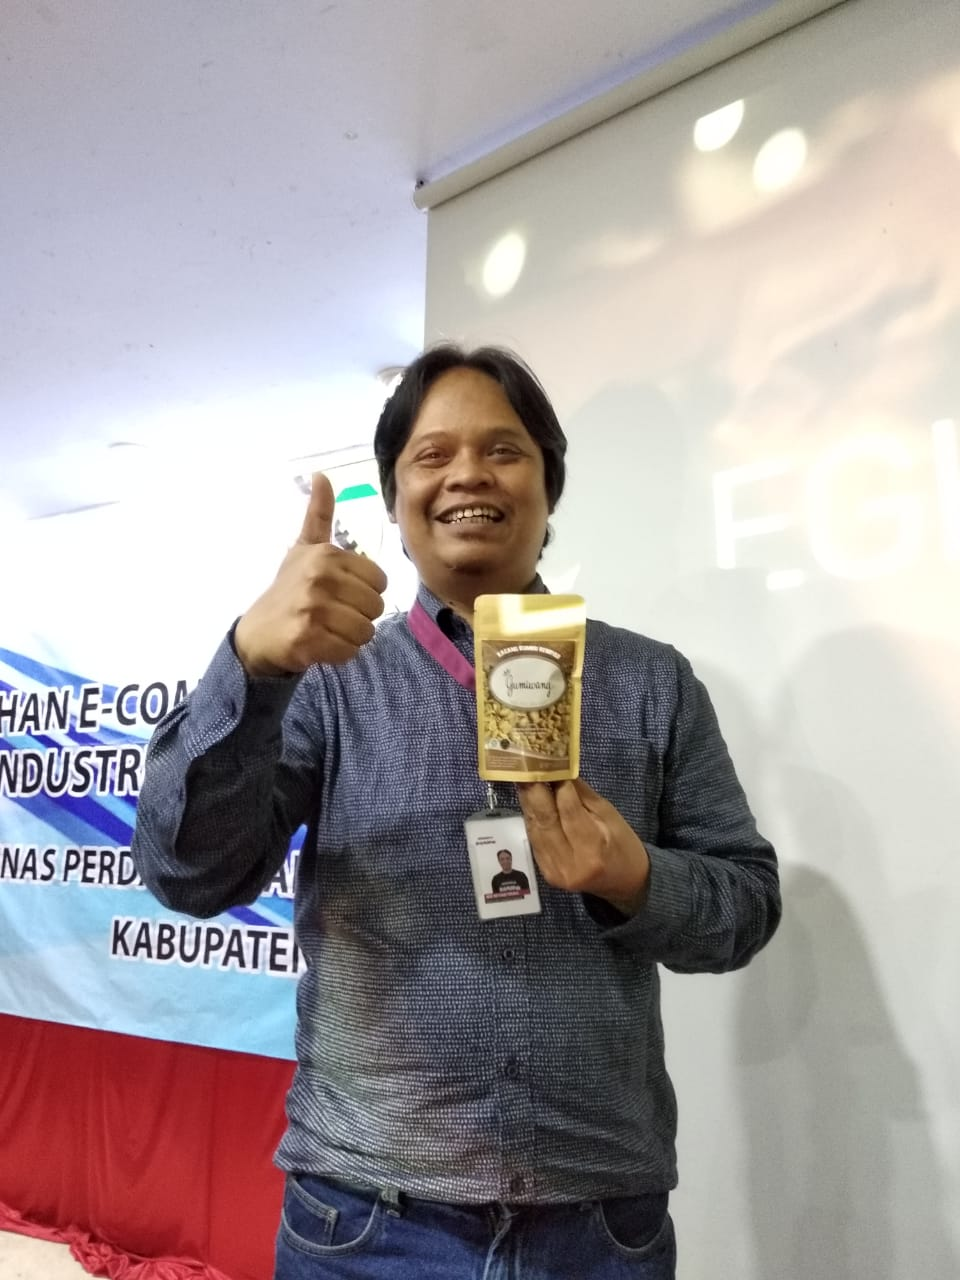 adetruna memegang produk cemilan ukm kabupaten bandung kacang bawang gumiwang